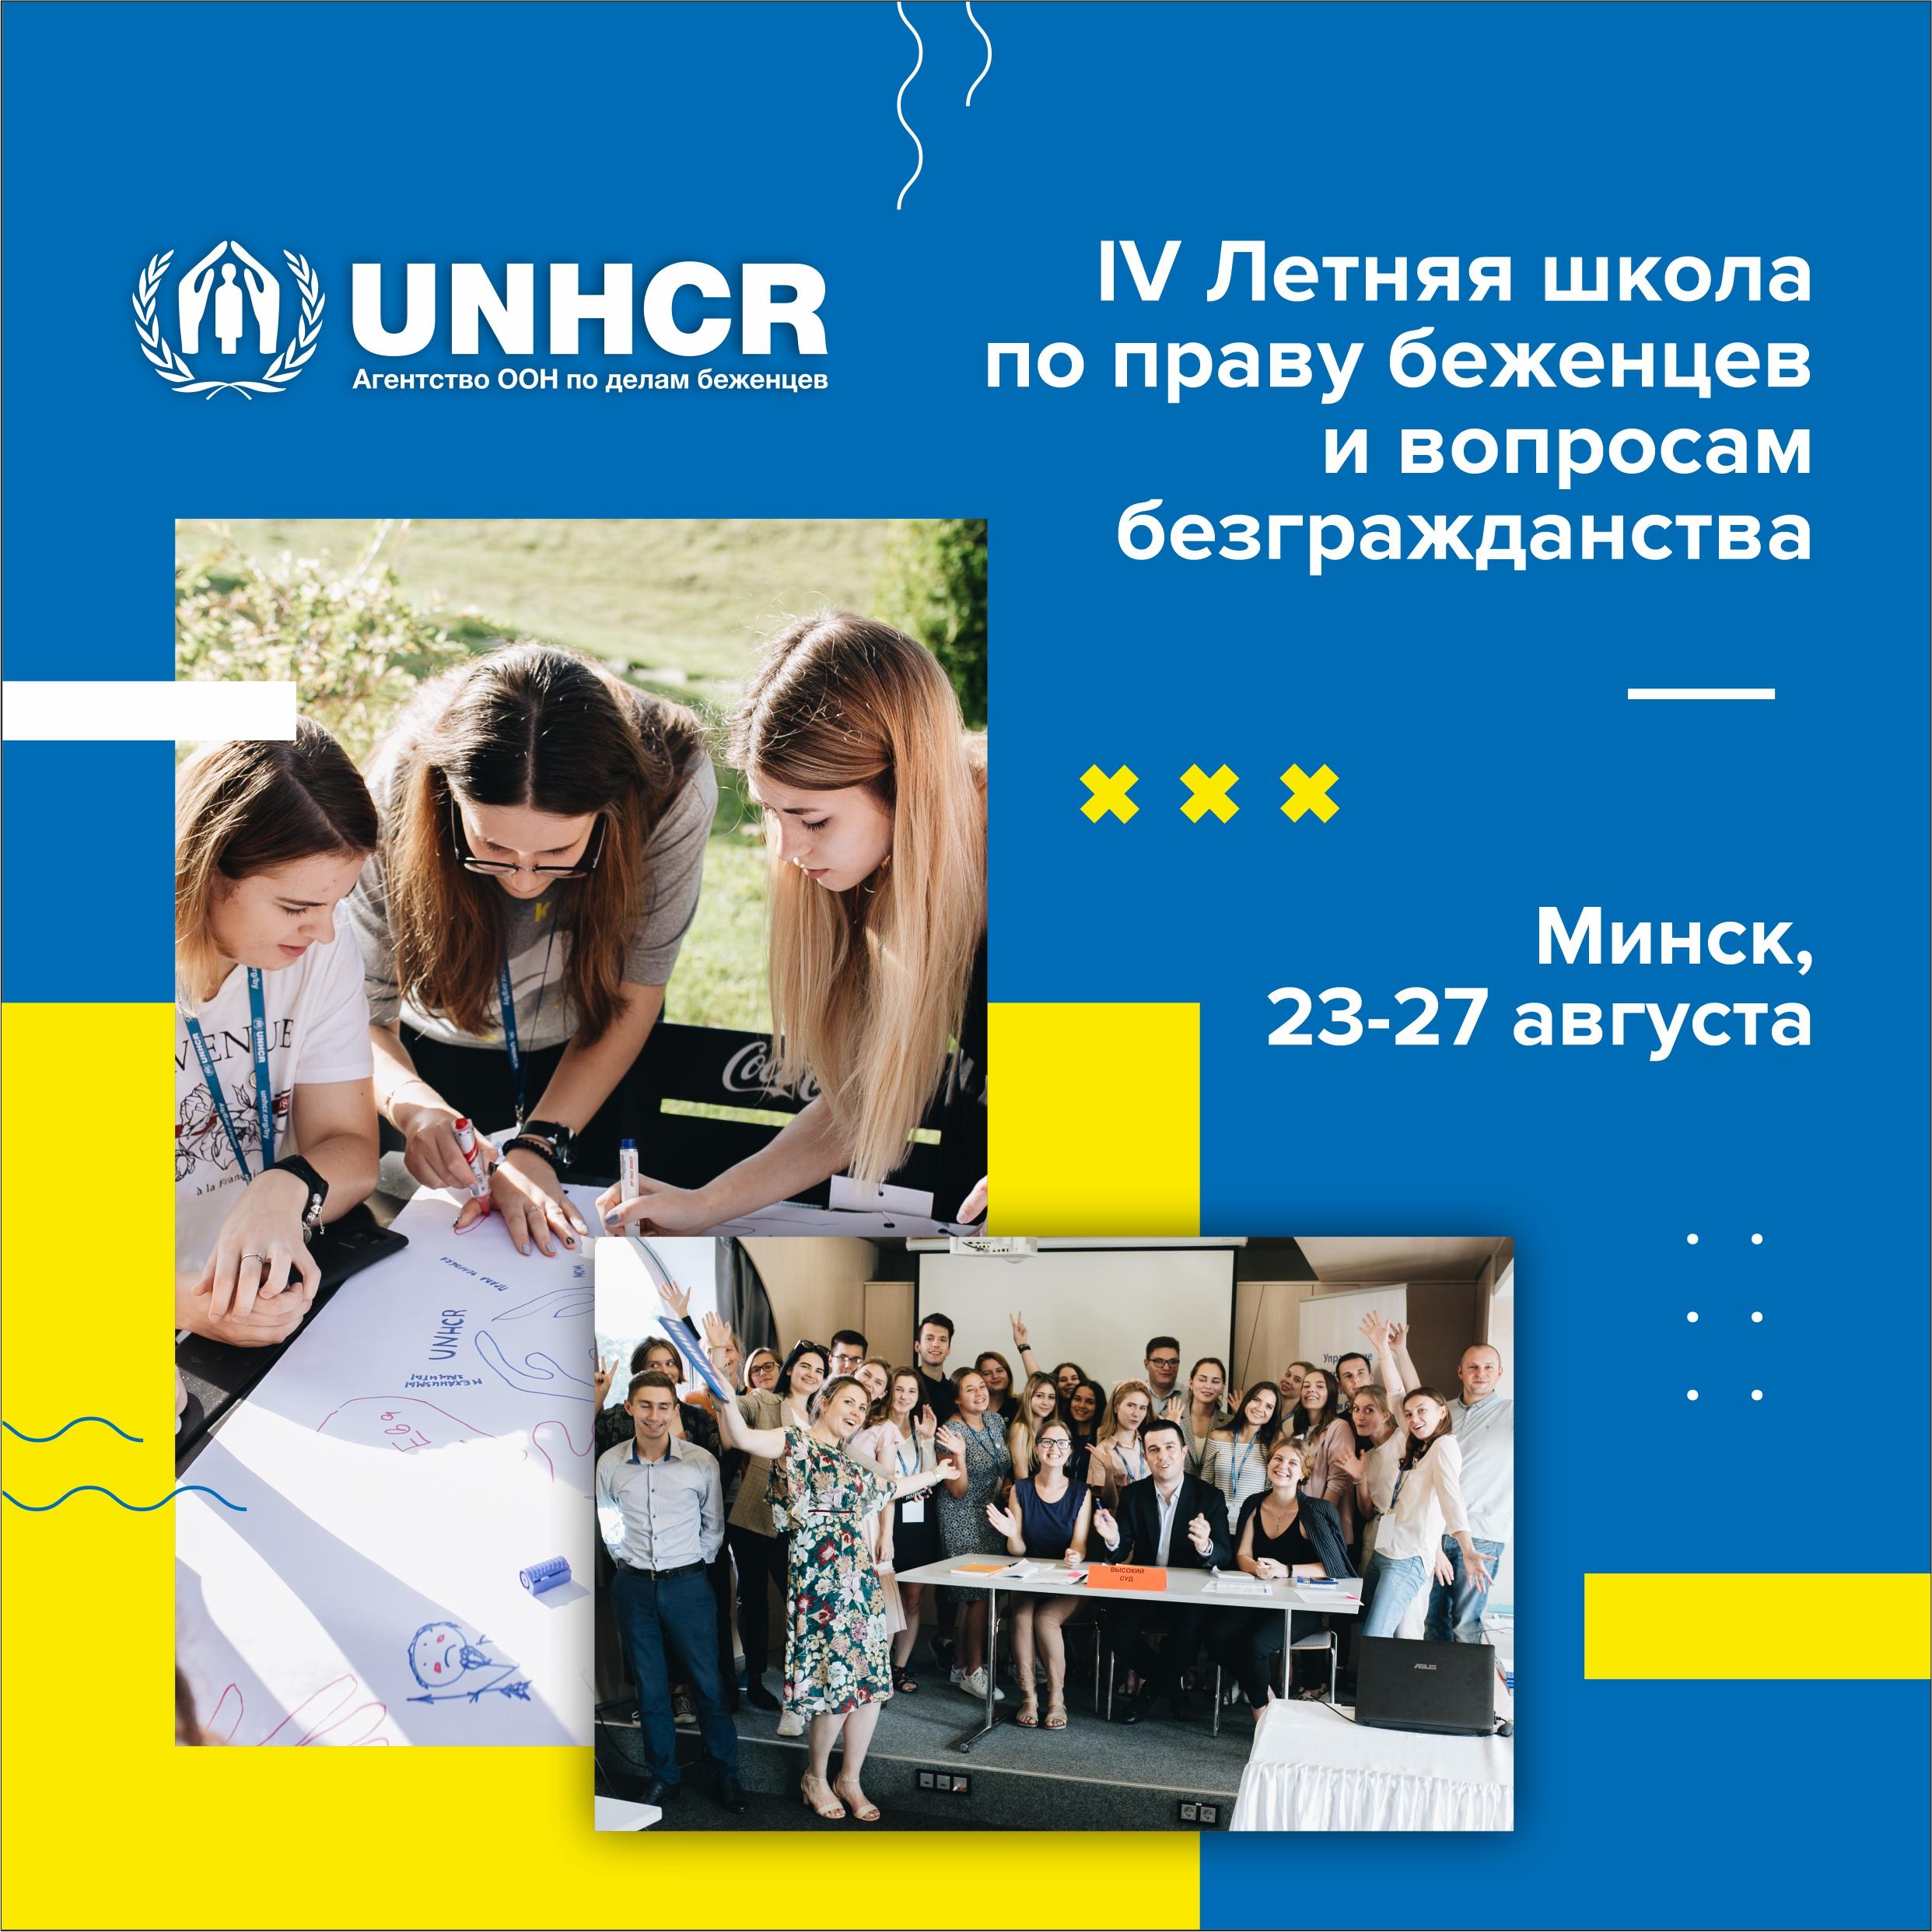 IV Летняя школа по праву беженцев и вопросам безгражданства